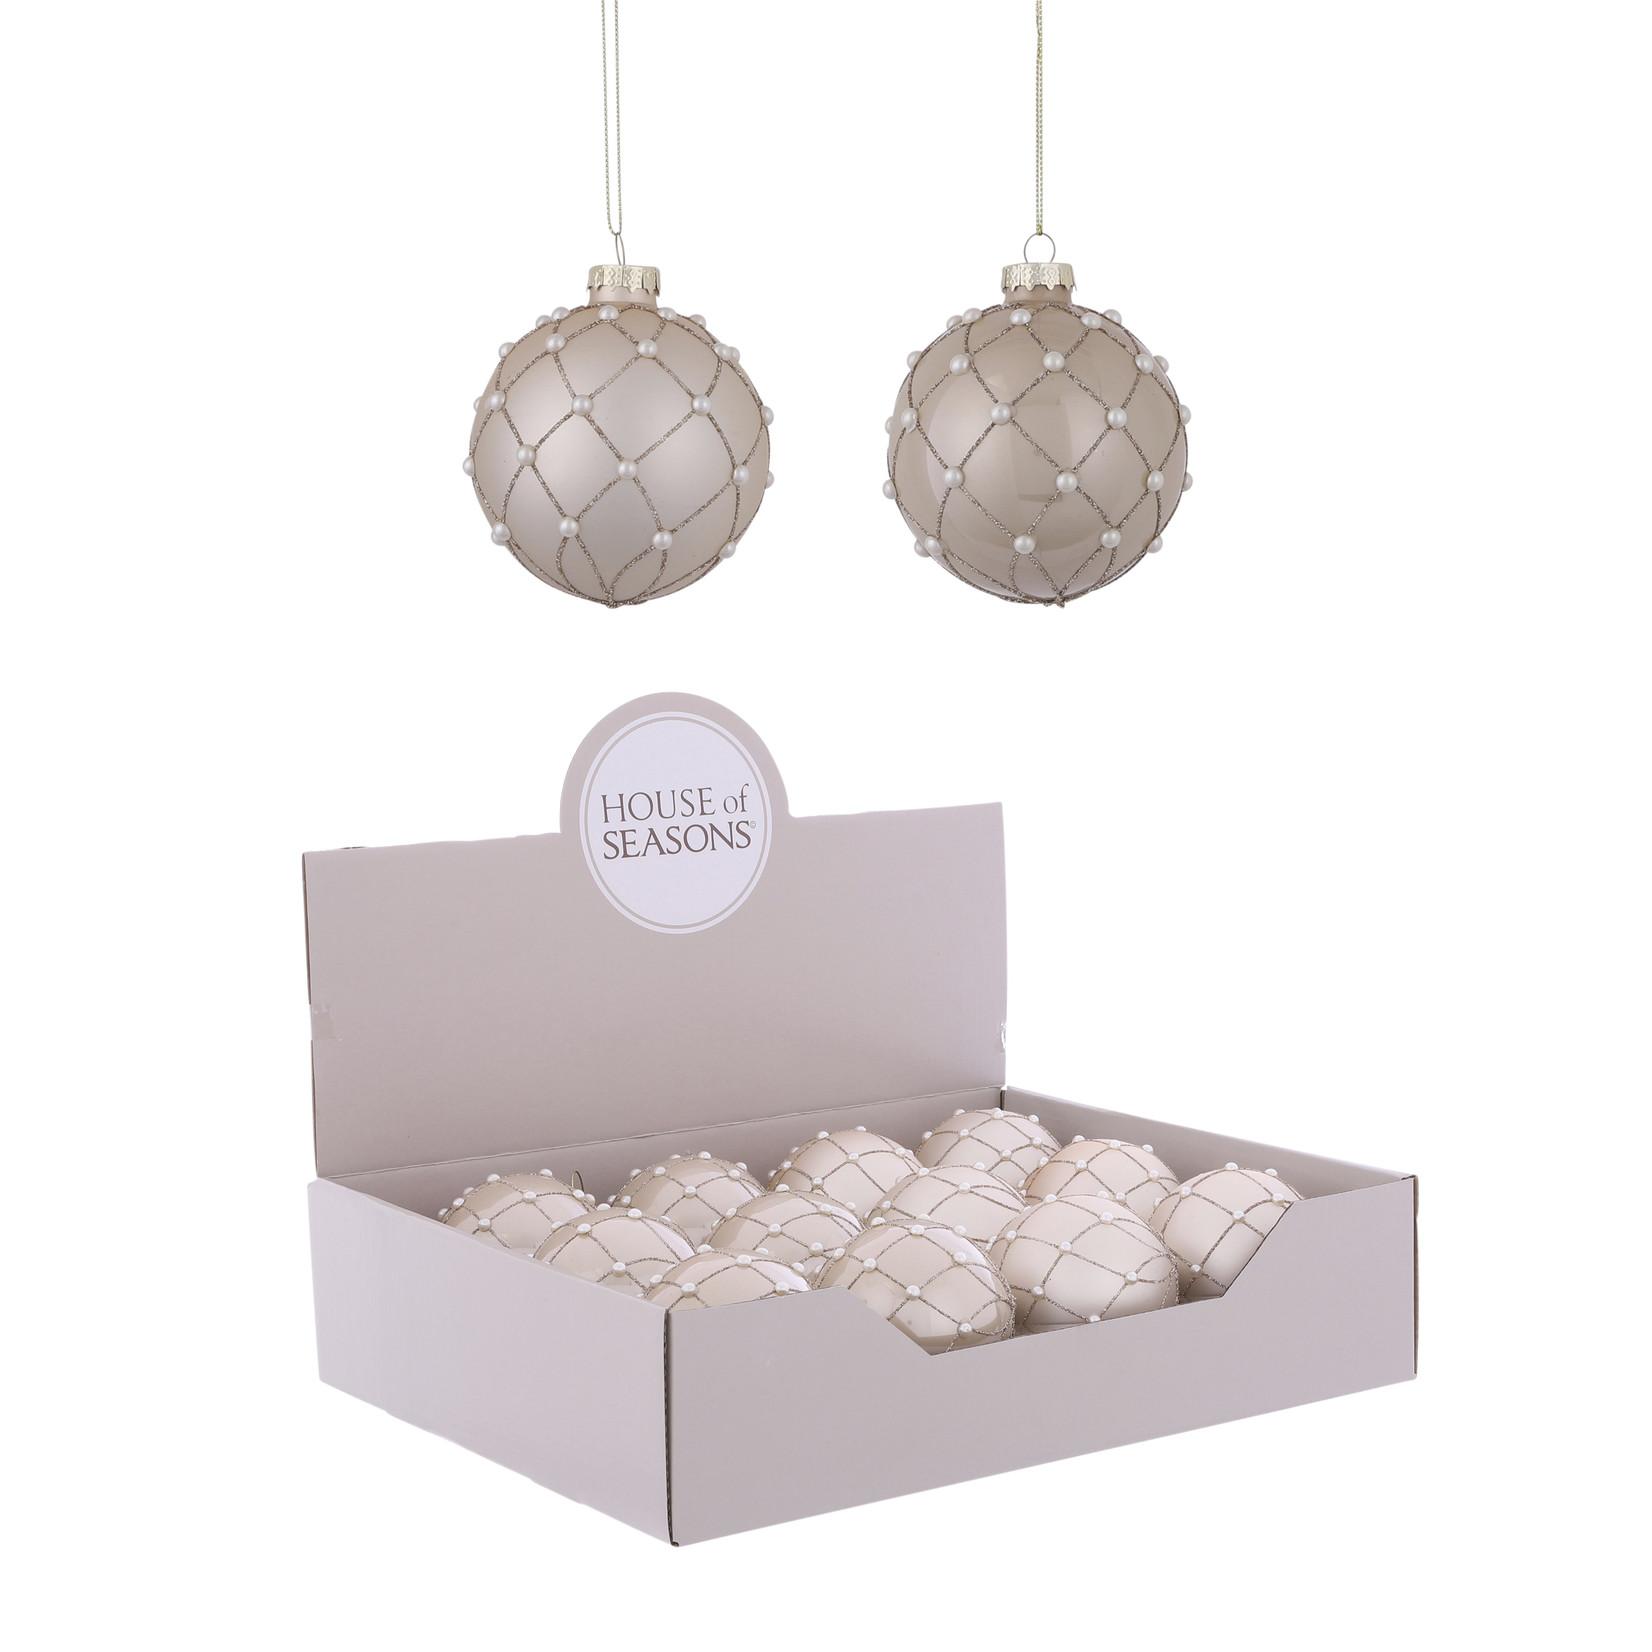 House of Seasons Ornament ball cream 2 assorted